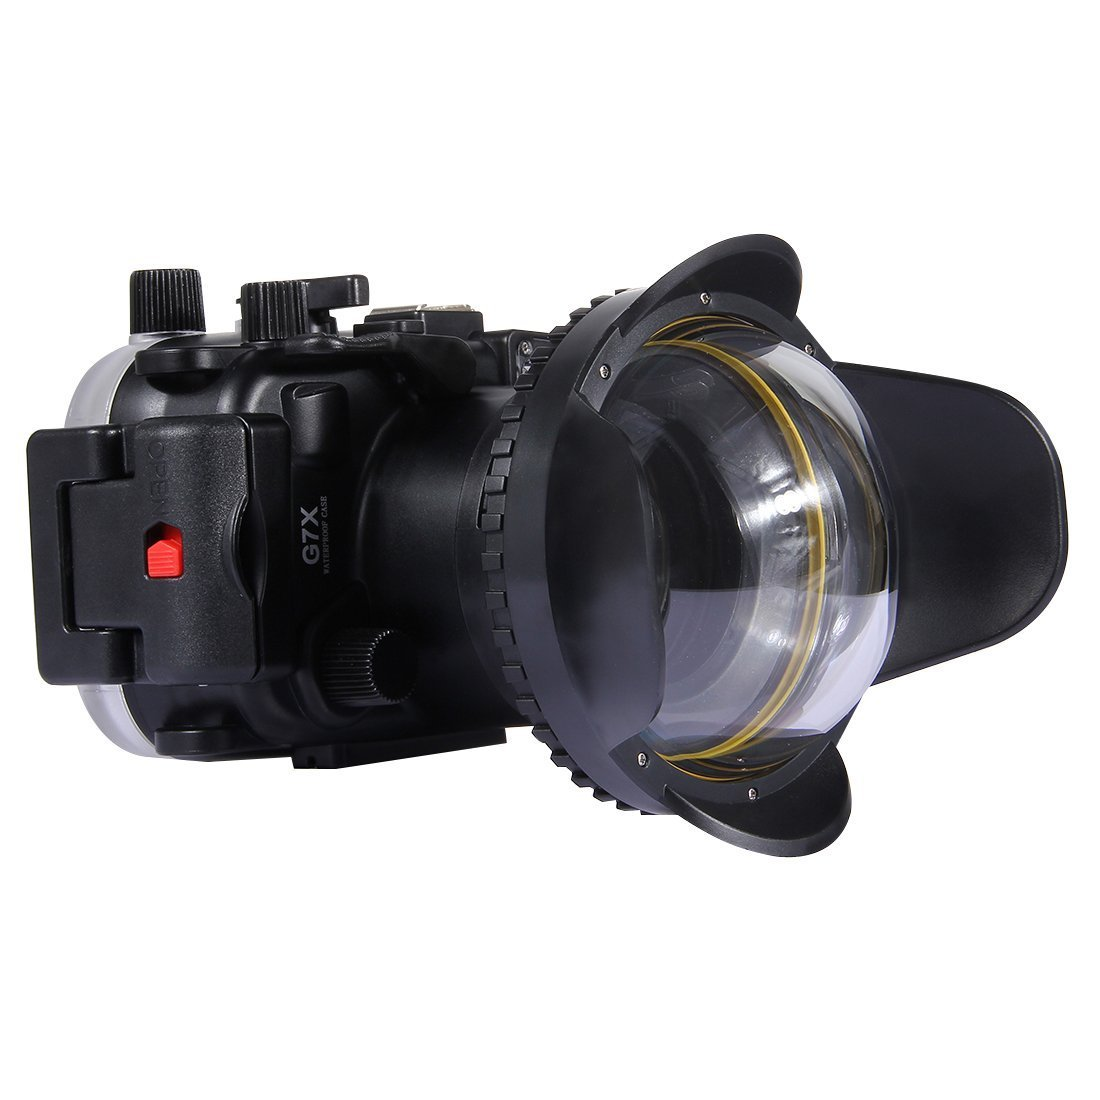 Market&YCY 光学魚眼レンズシェードアイレンズ 広角ドームポート 水中ハウジング用 (67mmラウンドアダプター) 40m/130フィート 水中深度   B07KLJMHPD